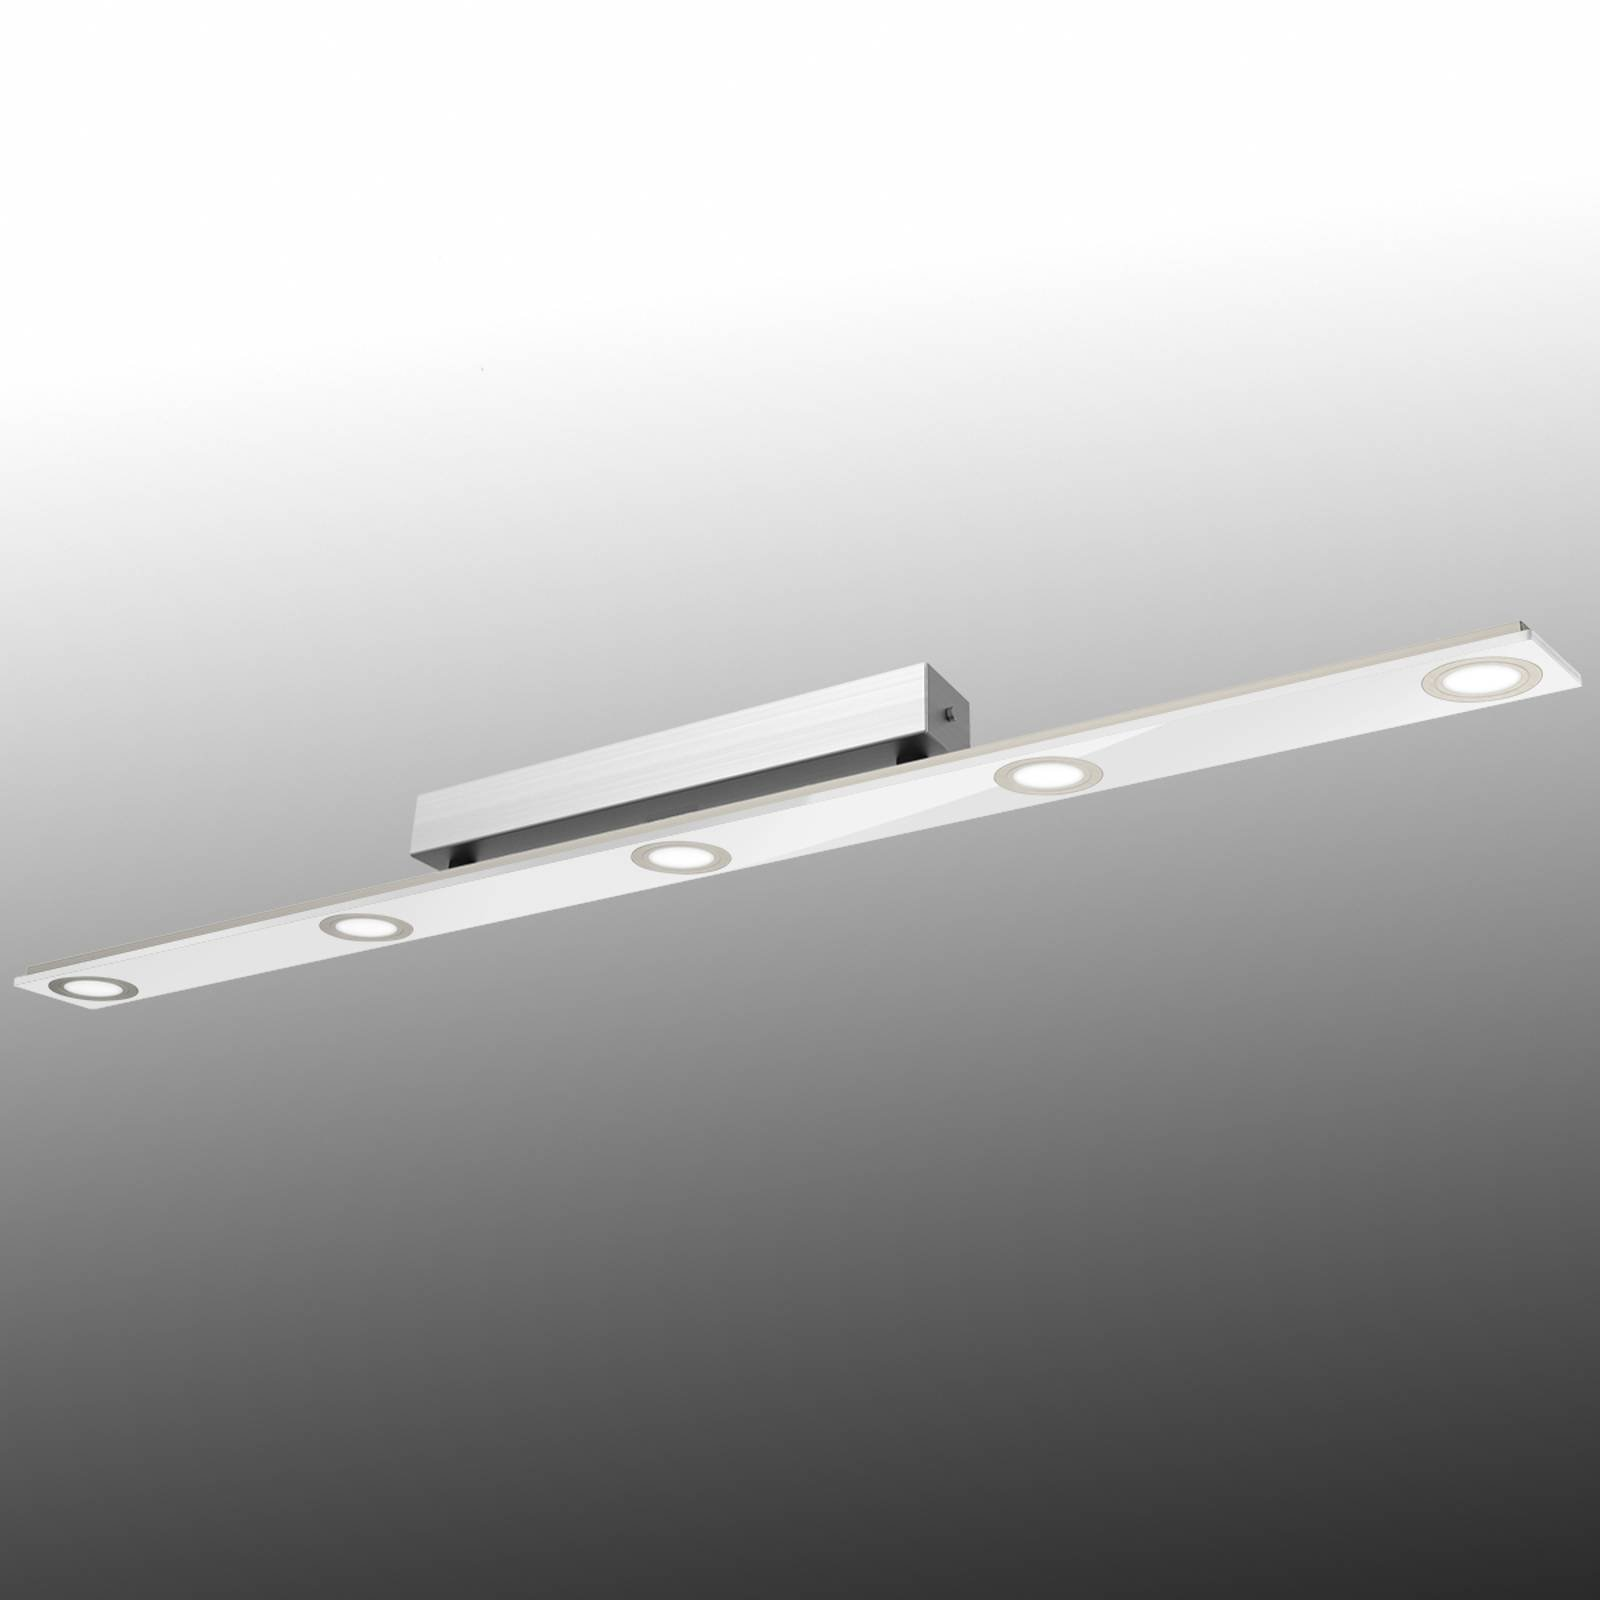 Avlang LED-taklampe Pano, hvit